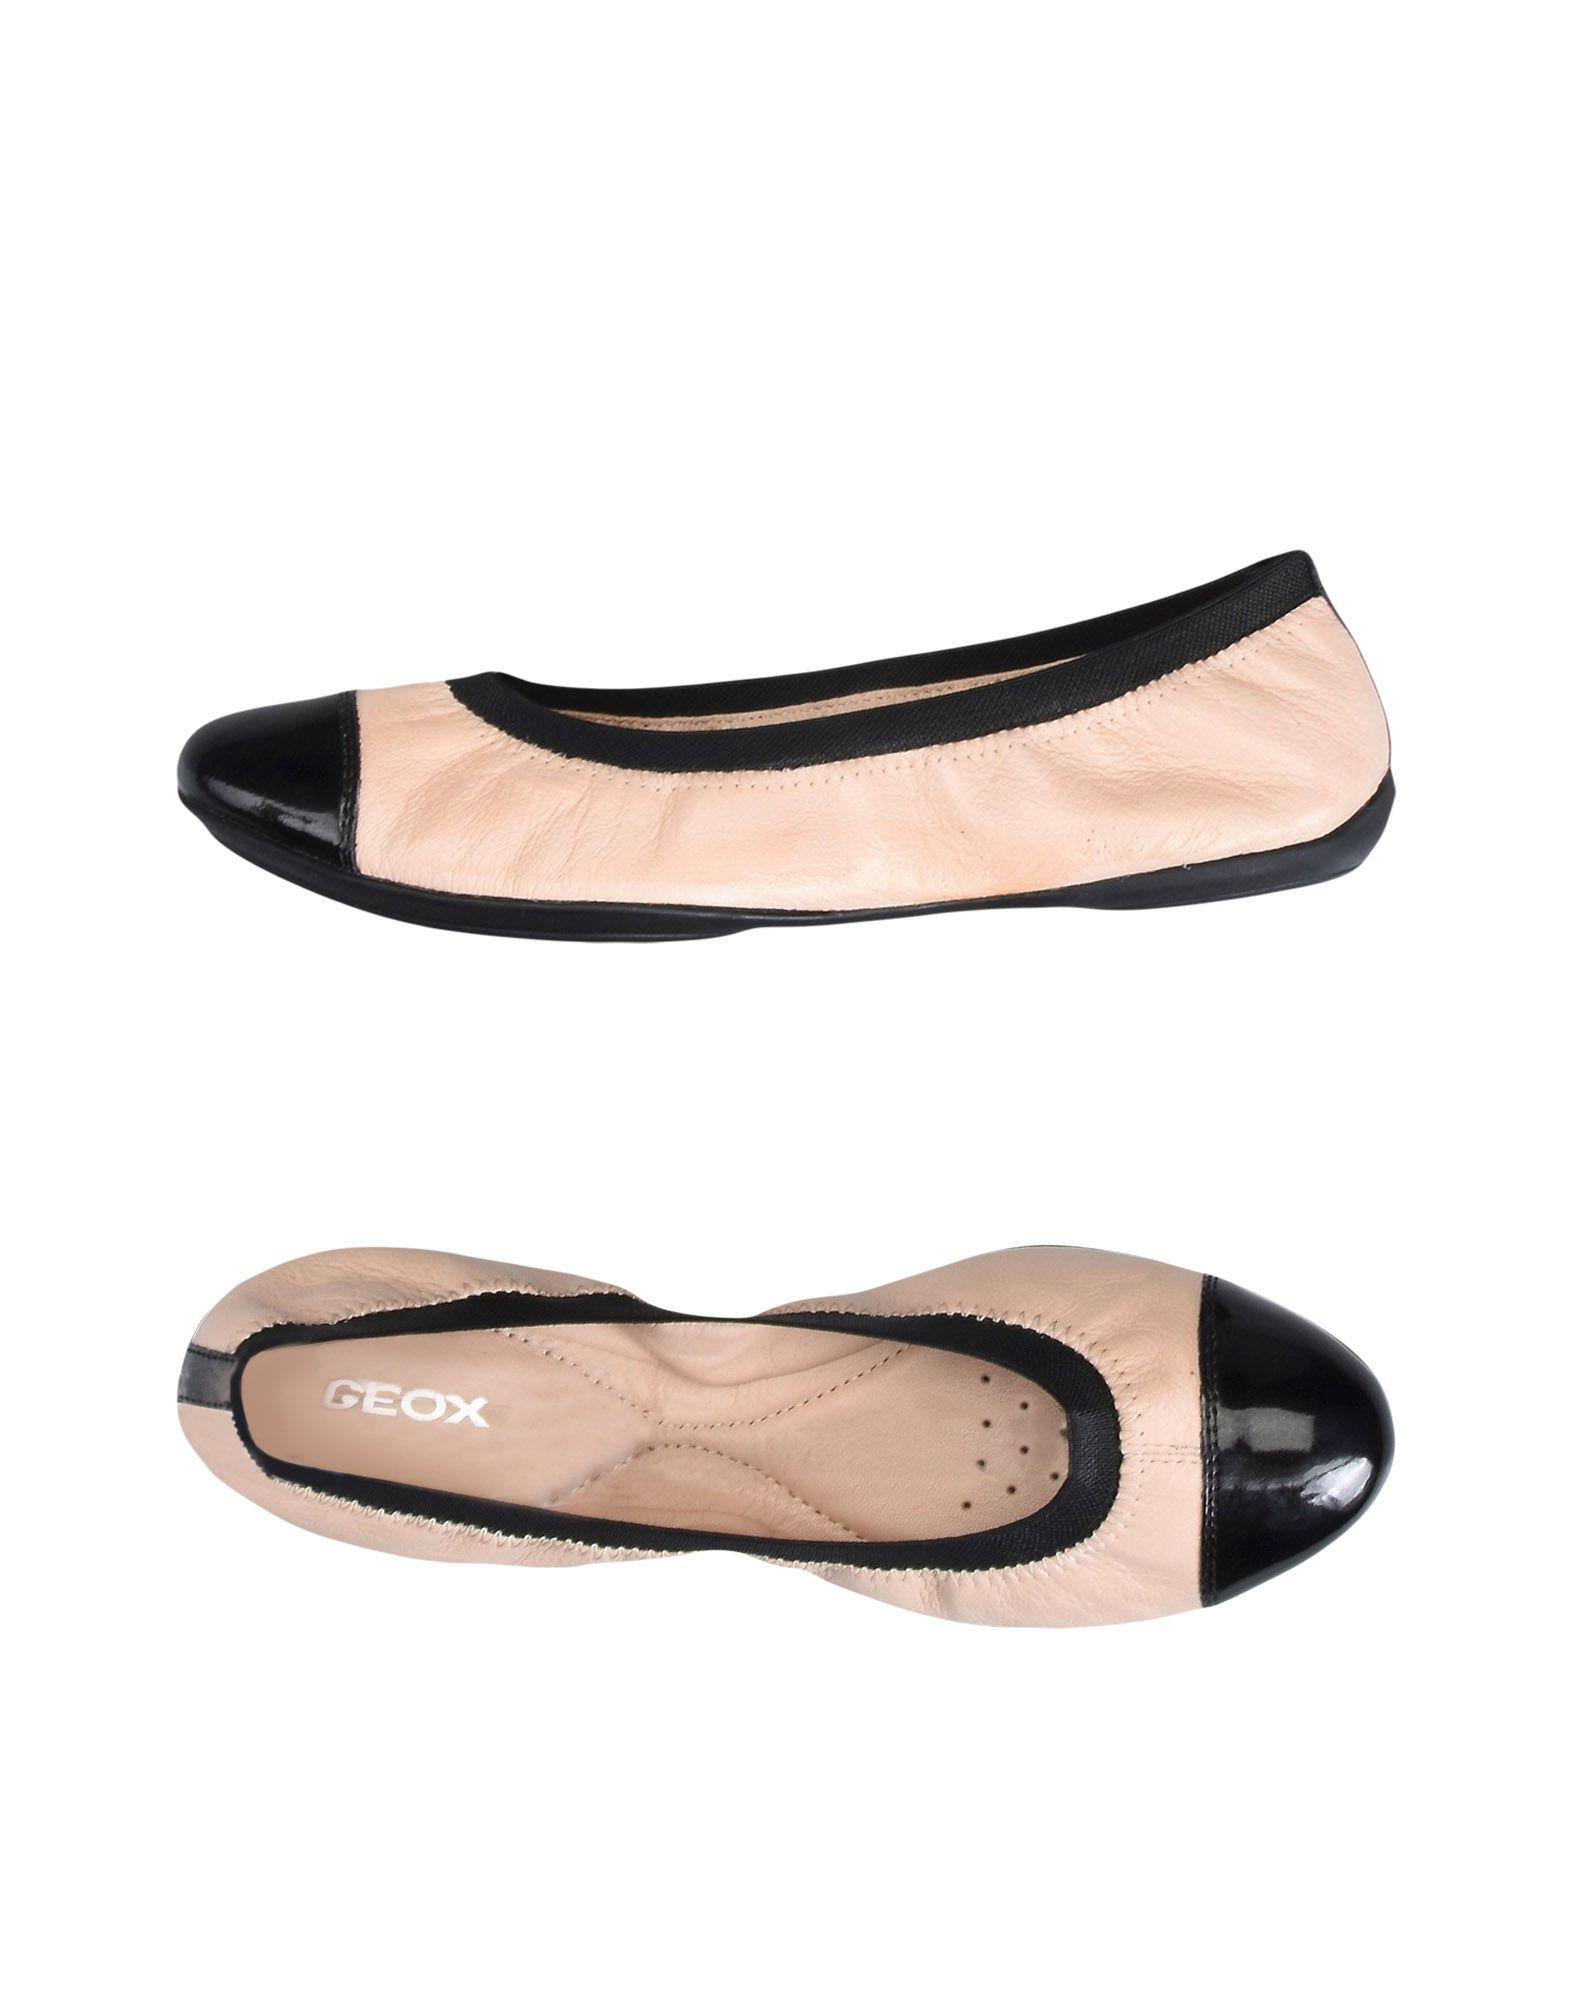 Ballerine Geox Donna - 11392324SA elegante